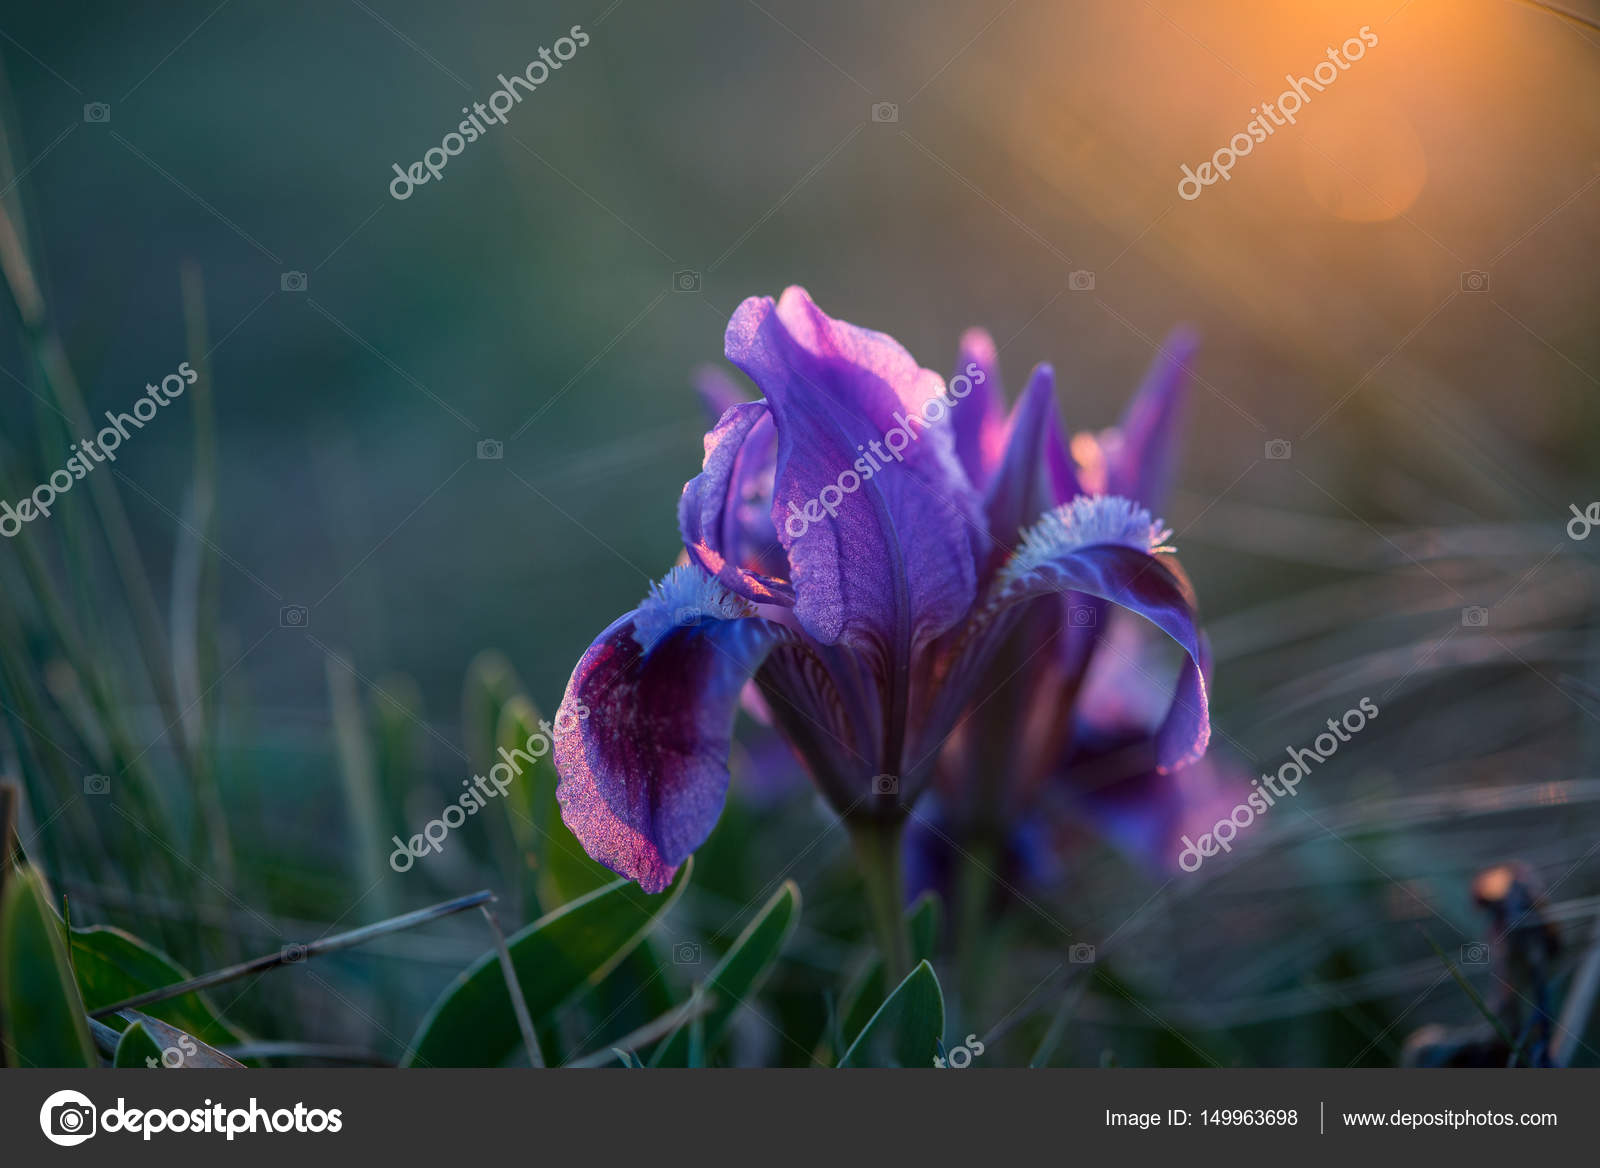 Wild purple iris flower stock photo mooseshop 149963698 wild purple iris flower stock photo izmirmasajfo